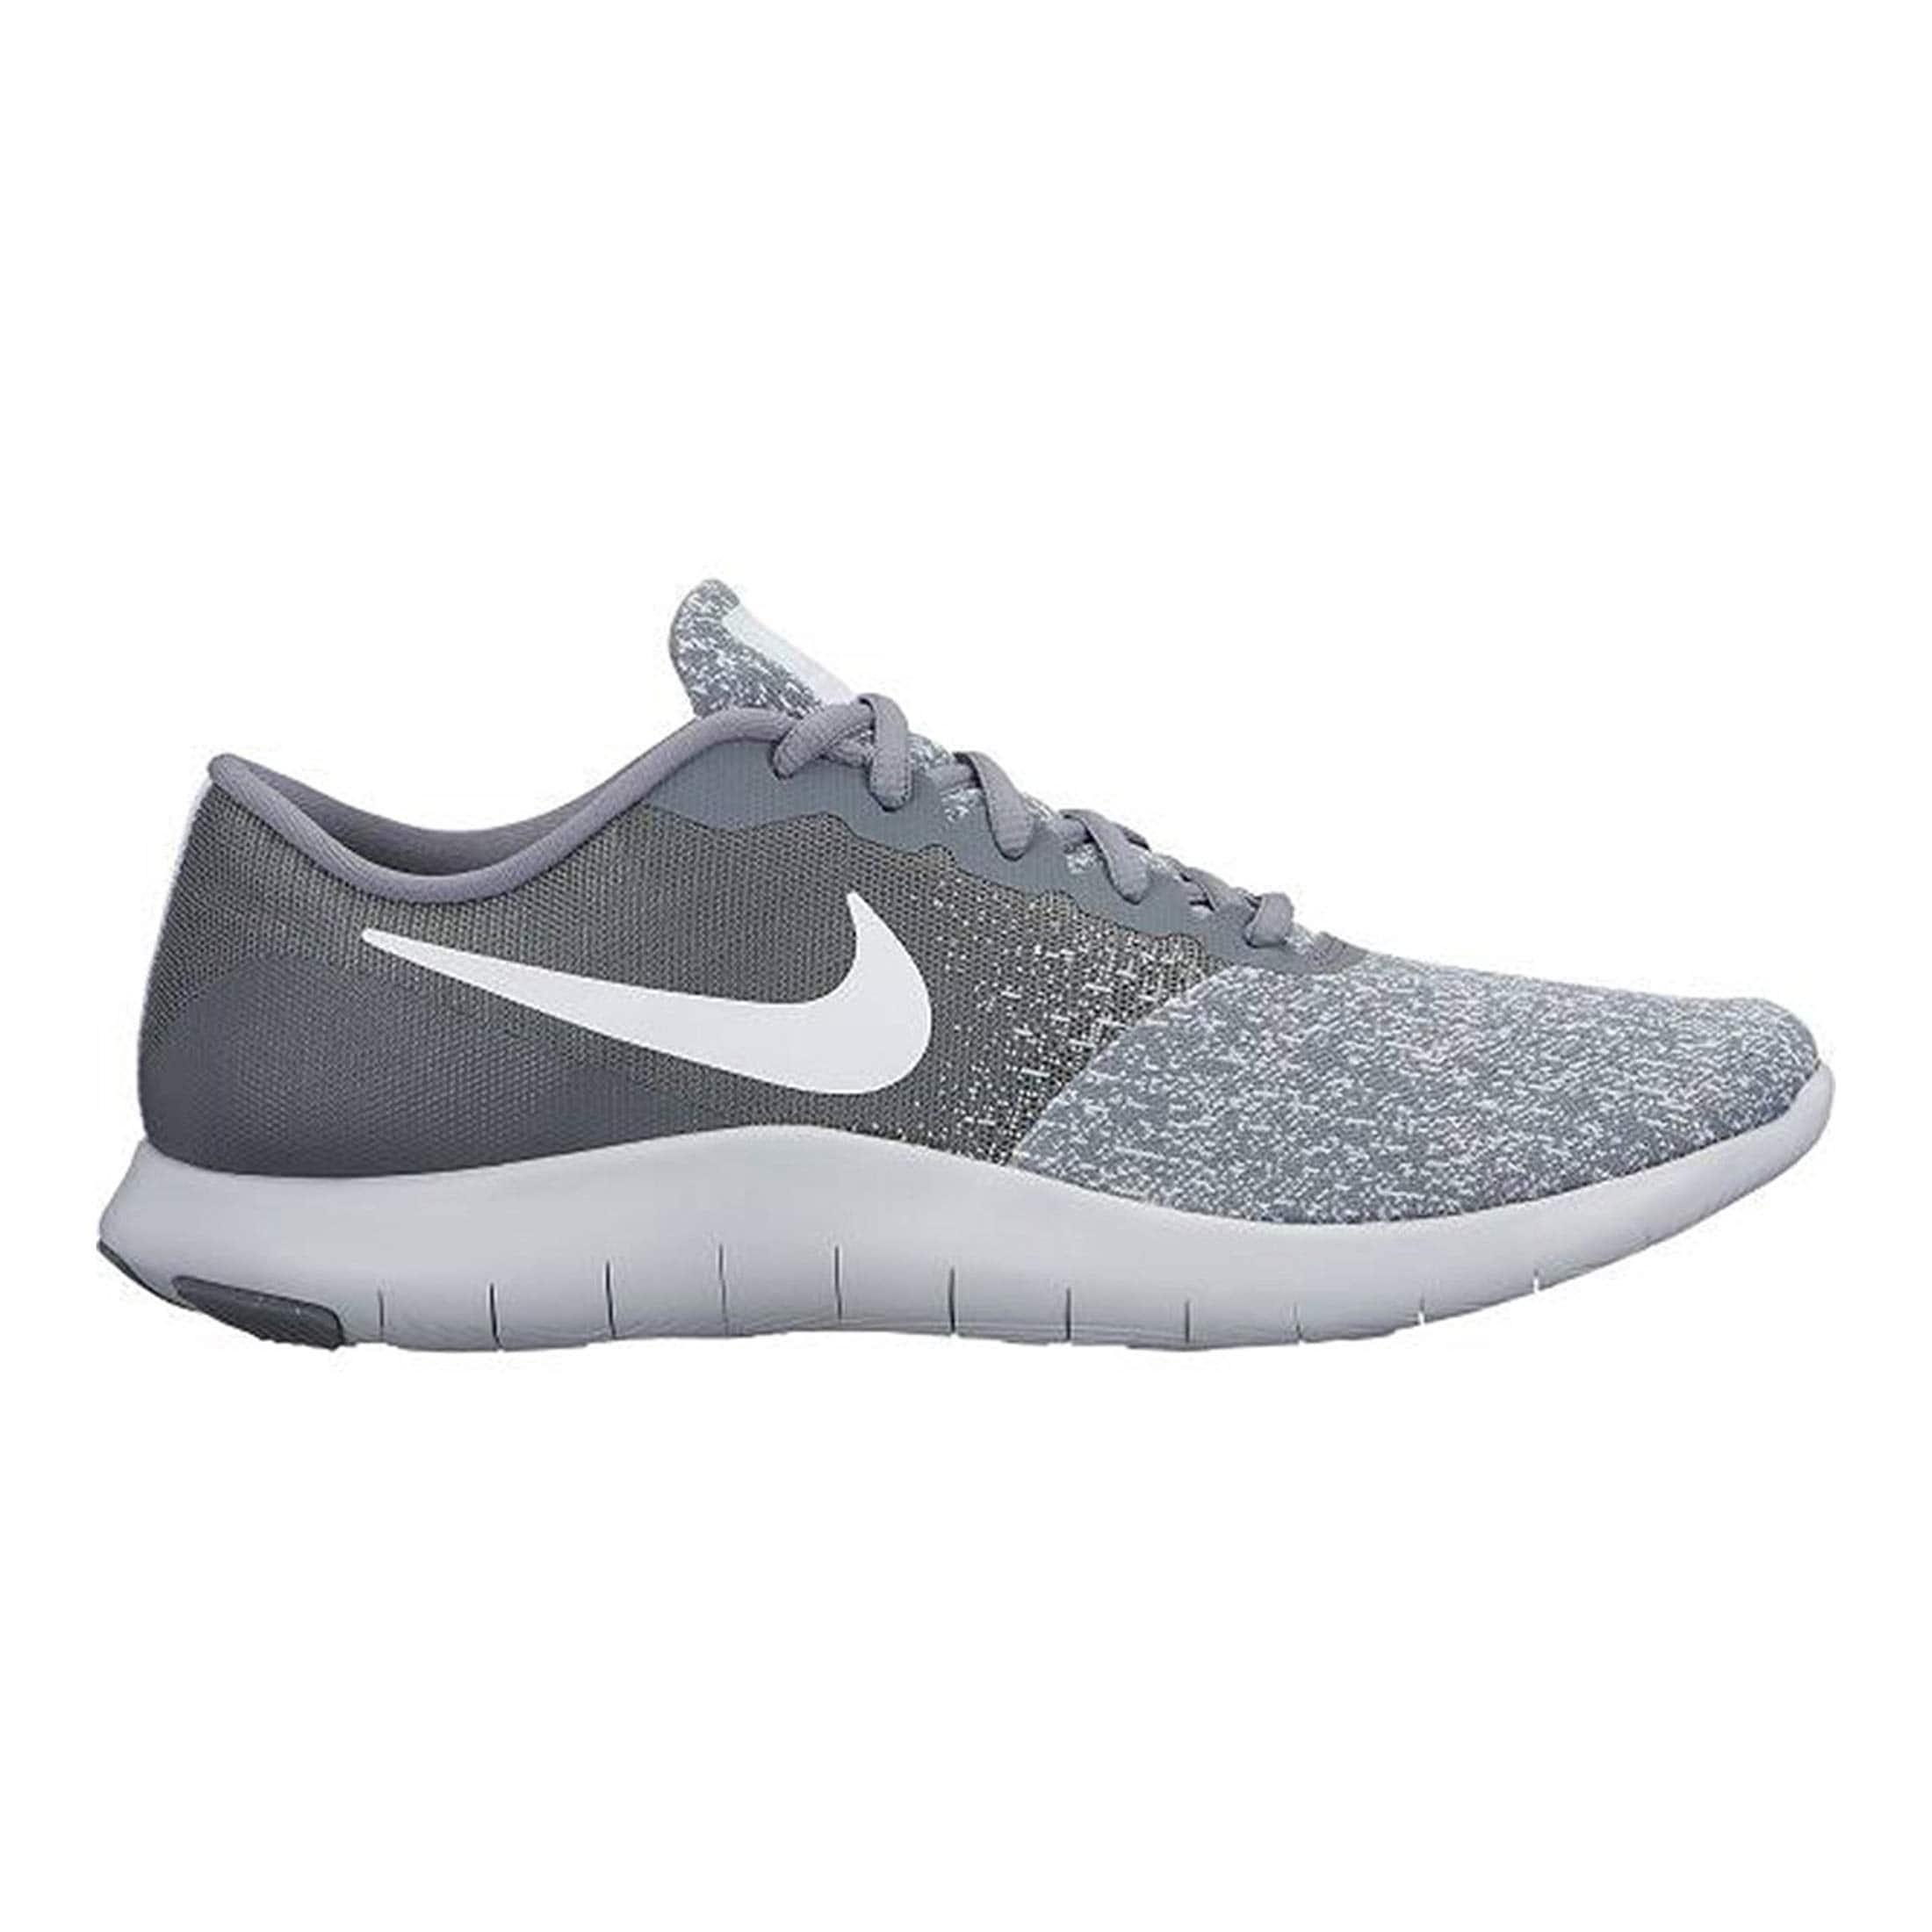 Plantando árboles Chicle Limpiamente  Nike Flex Contact Mens Running Shoes - Overstock - 27125331